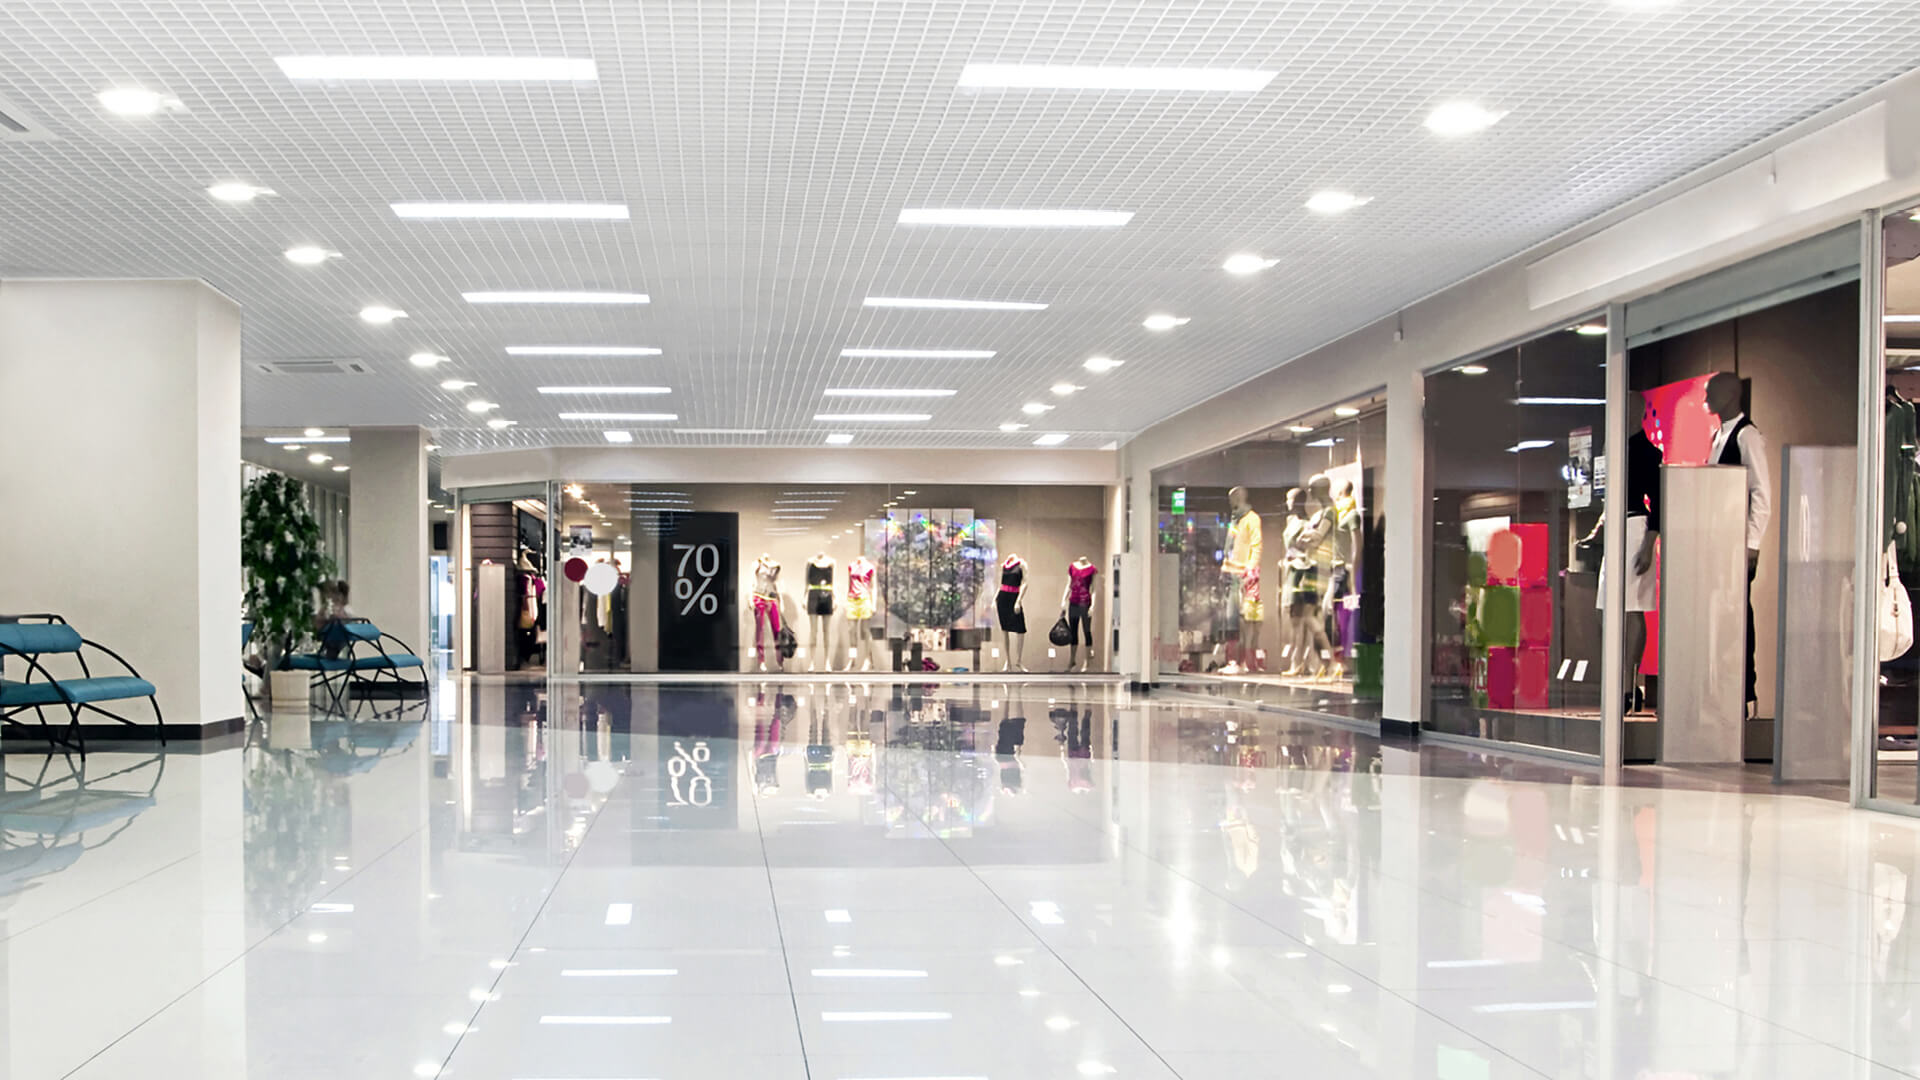 Enerqos settore gdo retail commercio